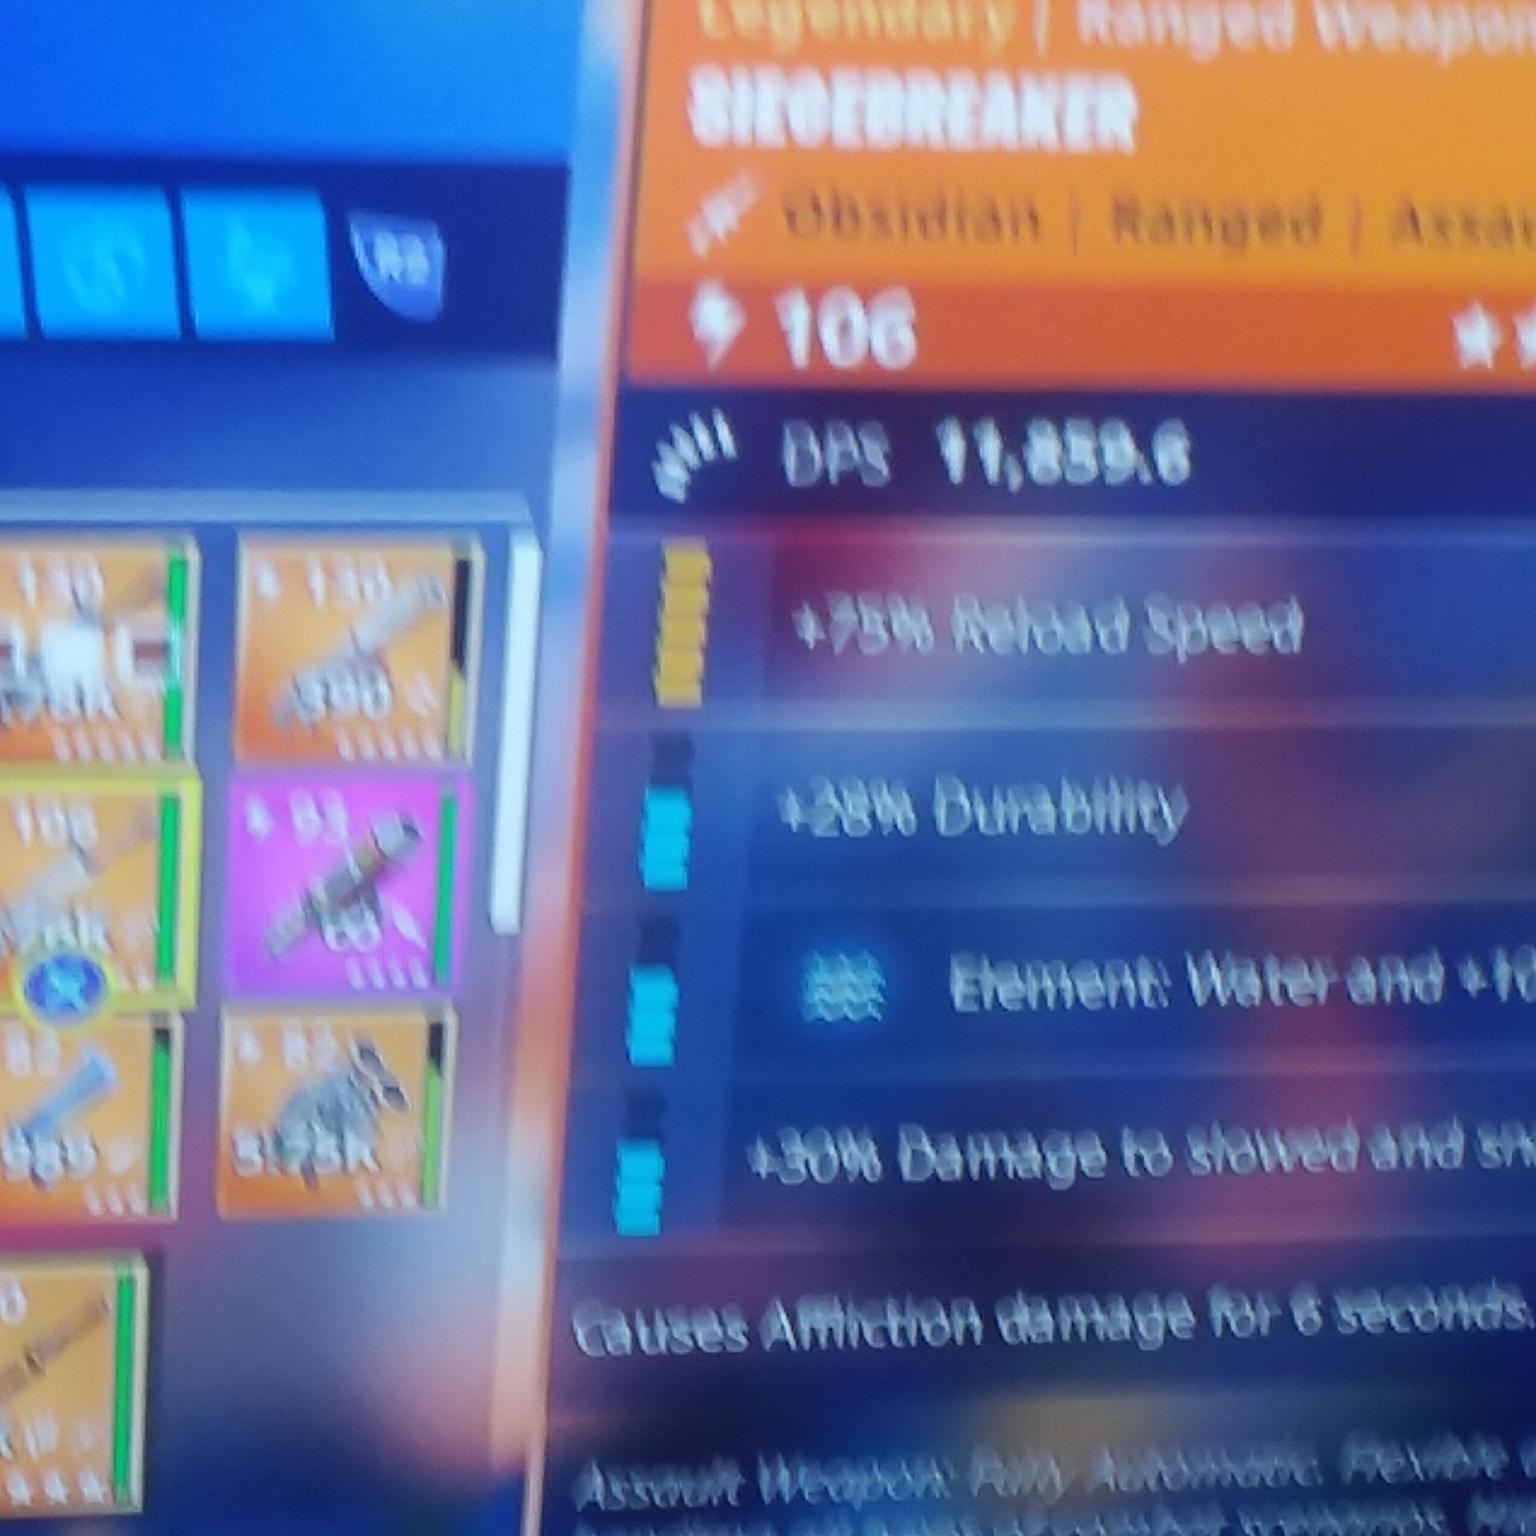 4 perk water 106 legendary siegebreaker